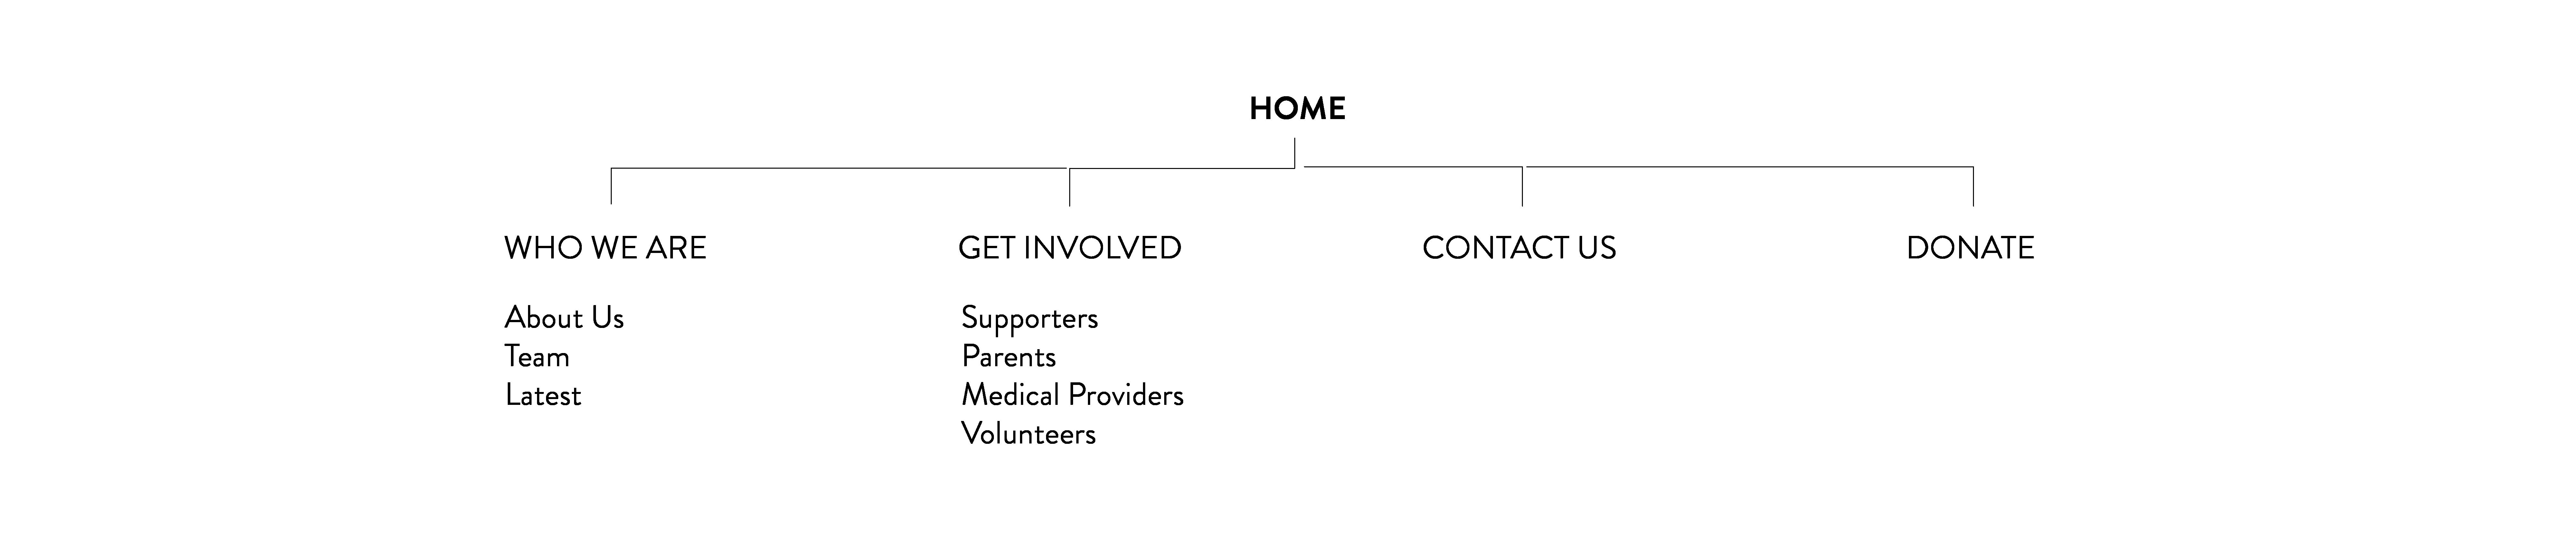 Personas-05